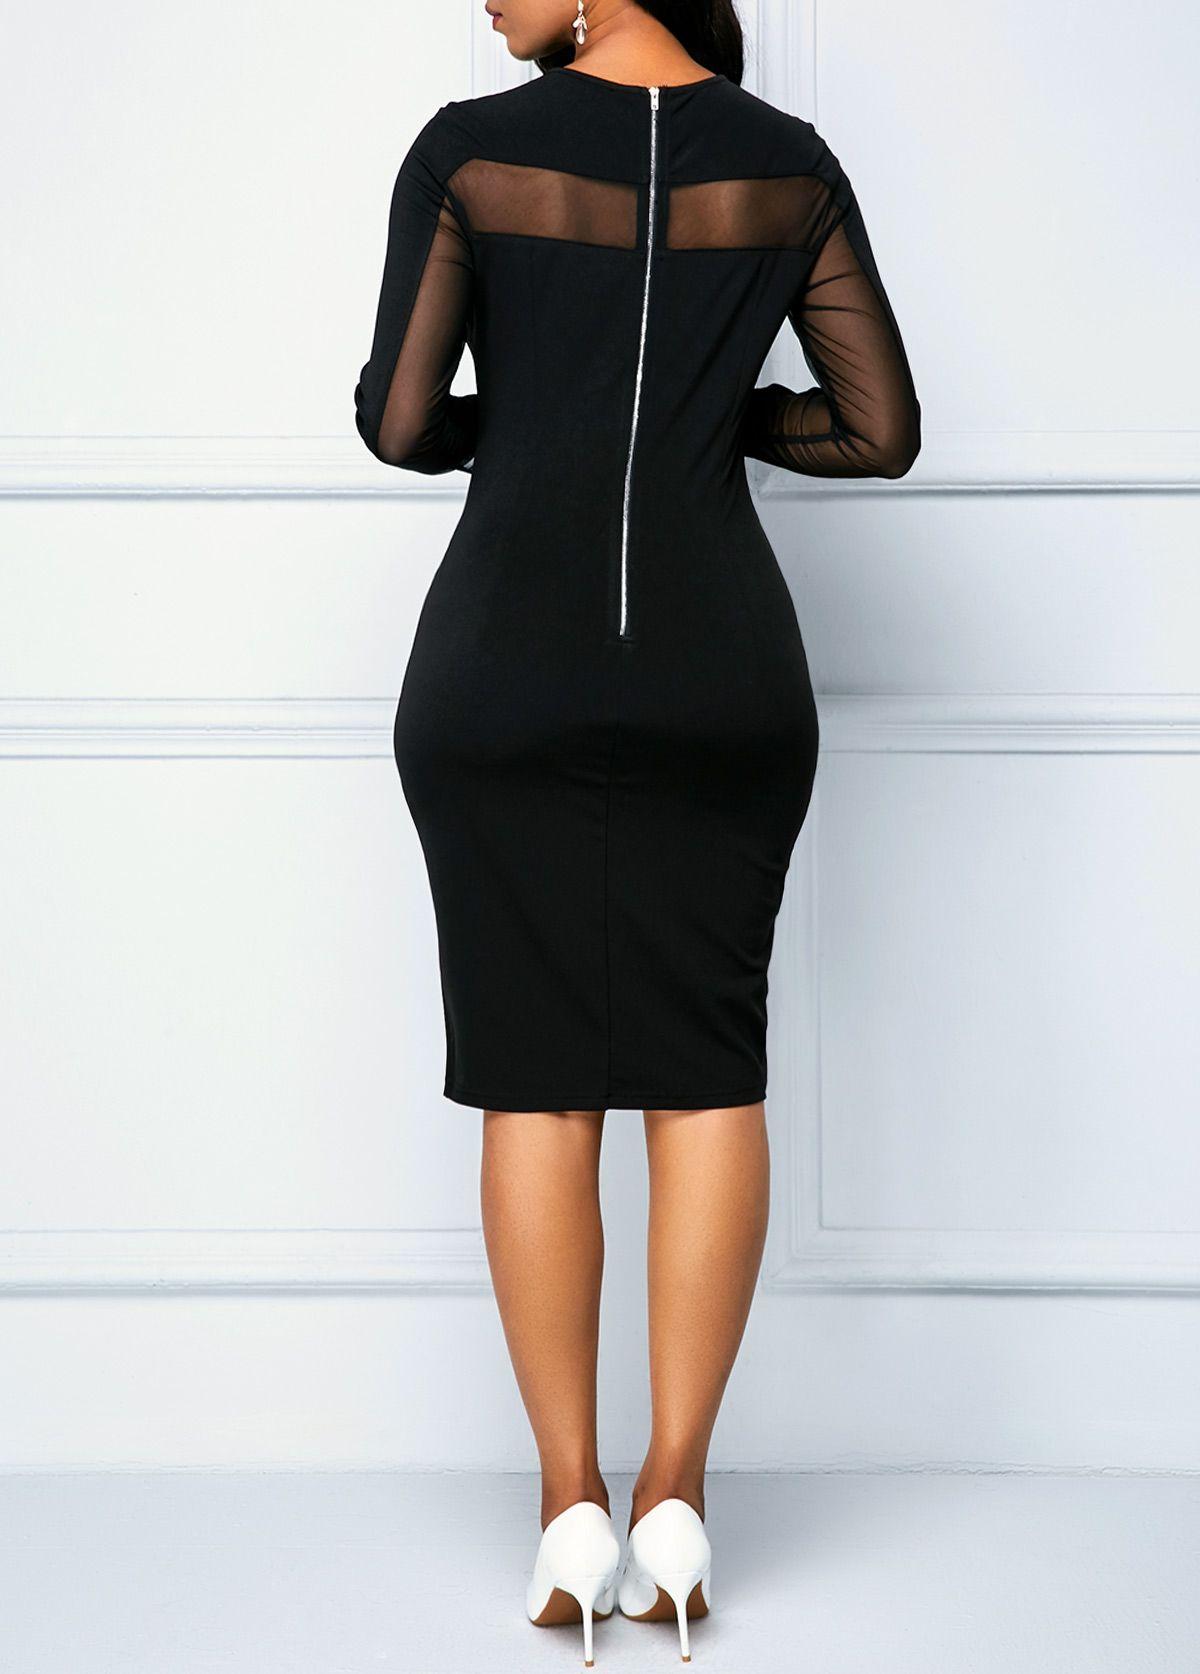 Black Zipper Back Long Sleeve Sheath Dress Rotita Com Usd 30 36 Long Sleeve Sheath Dress Black Sheath Dress Prom Dresses With Pockets [ 1674 x 1200 Pixel ]